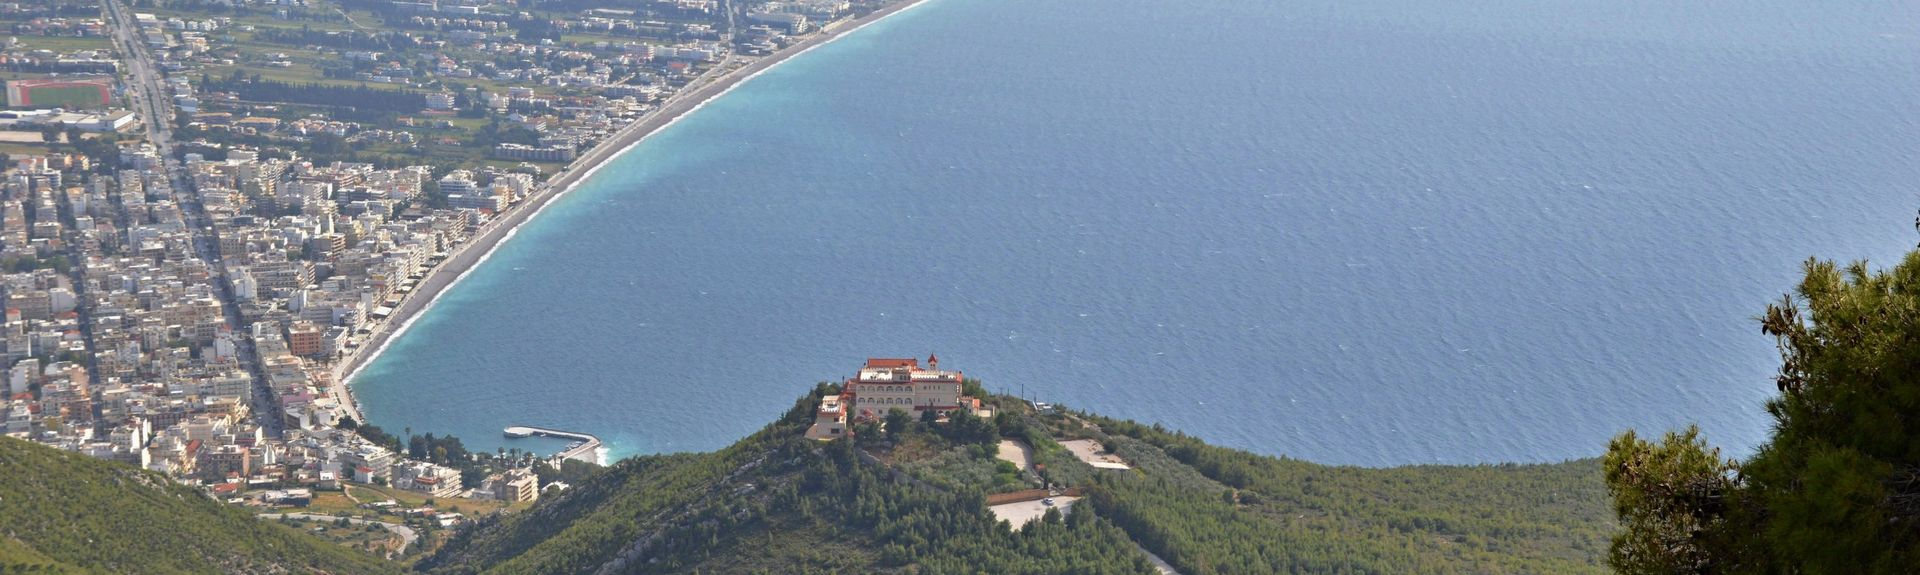 Soligia, Peloponnes, Griechenland